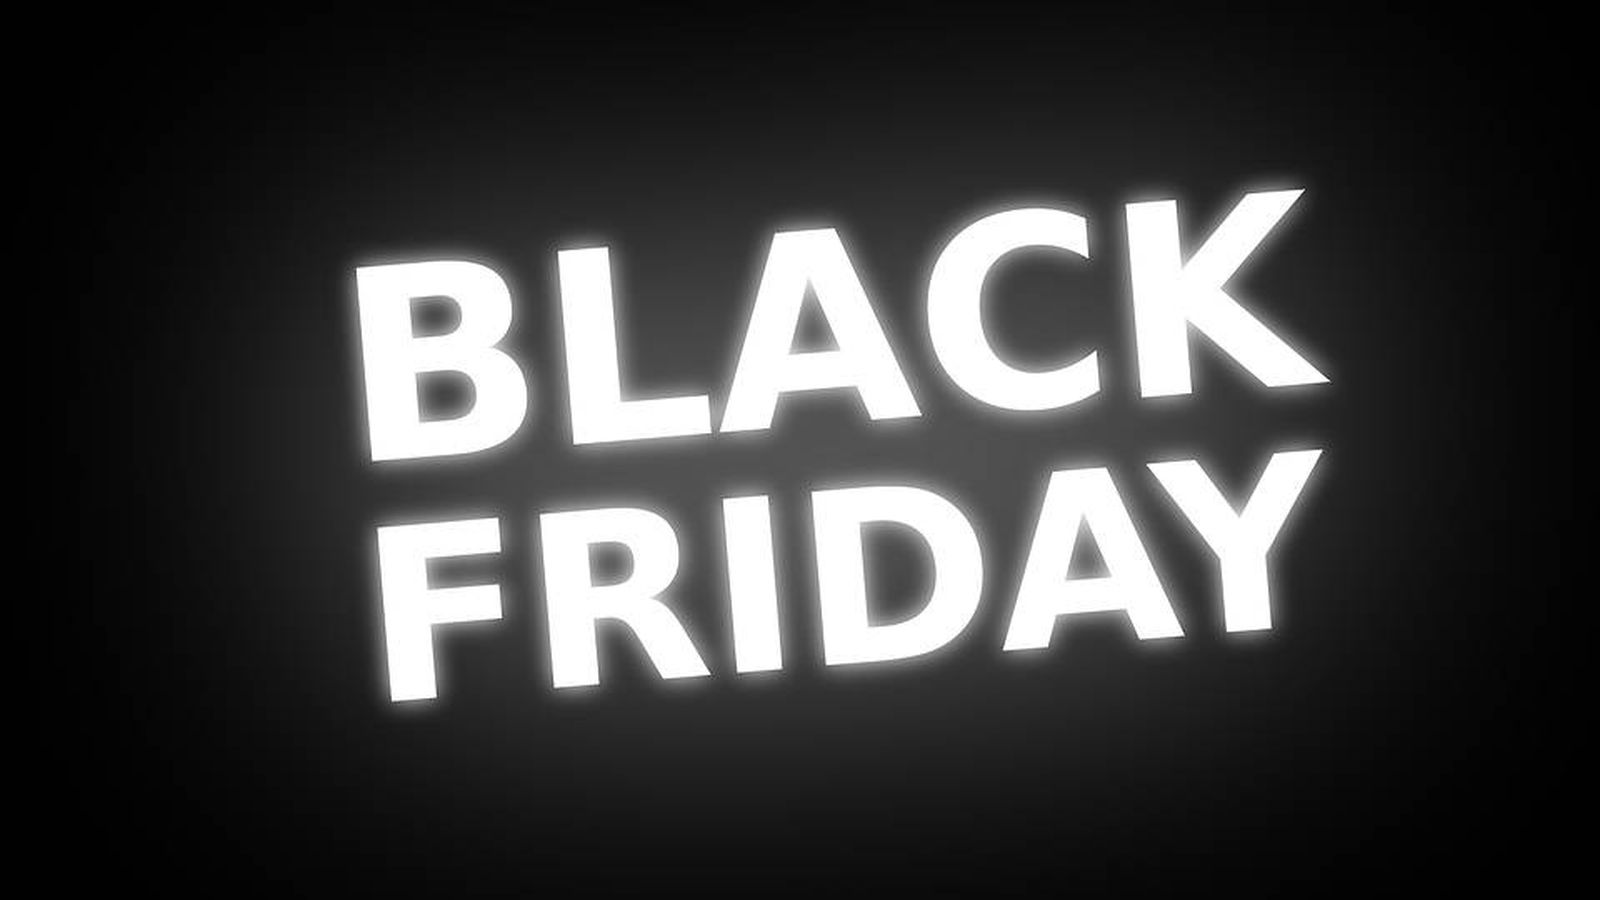 ikea online black friday sale